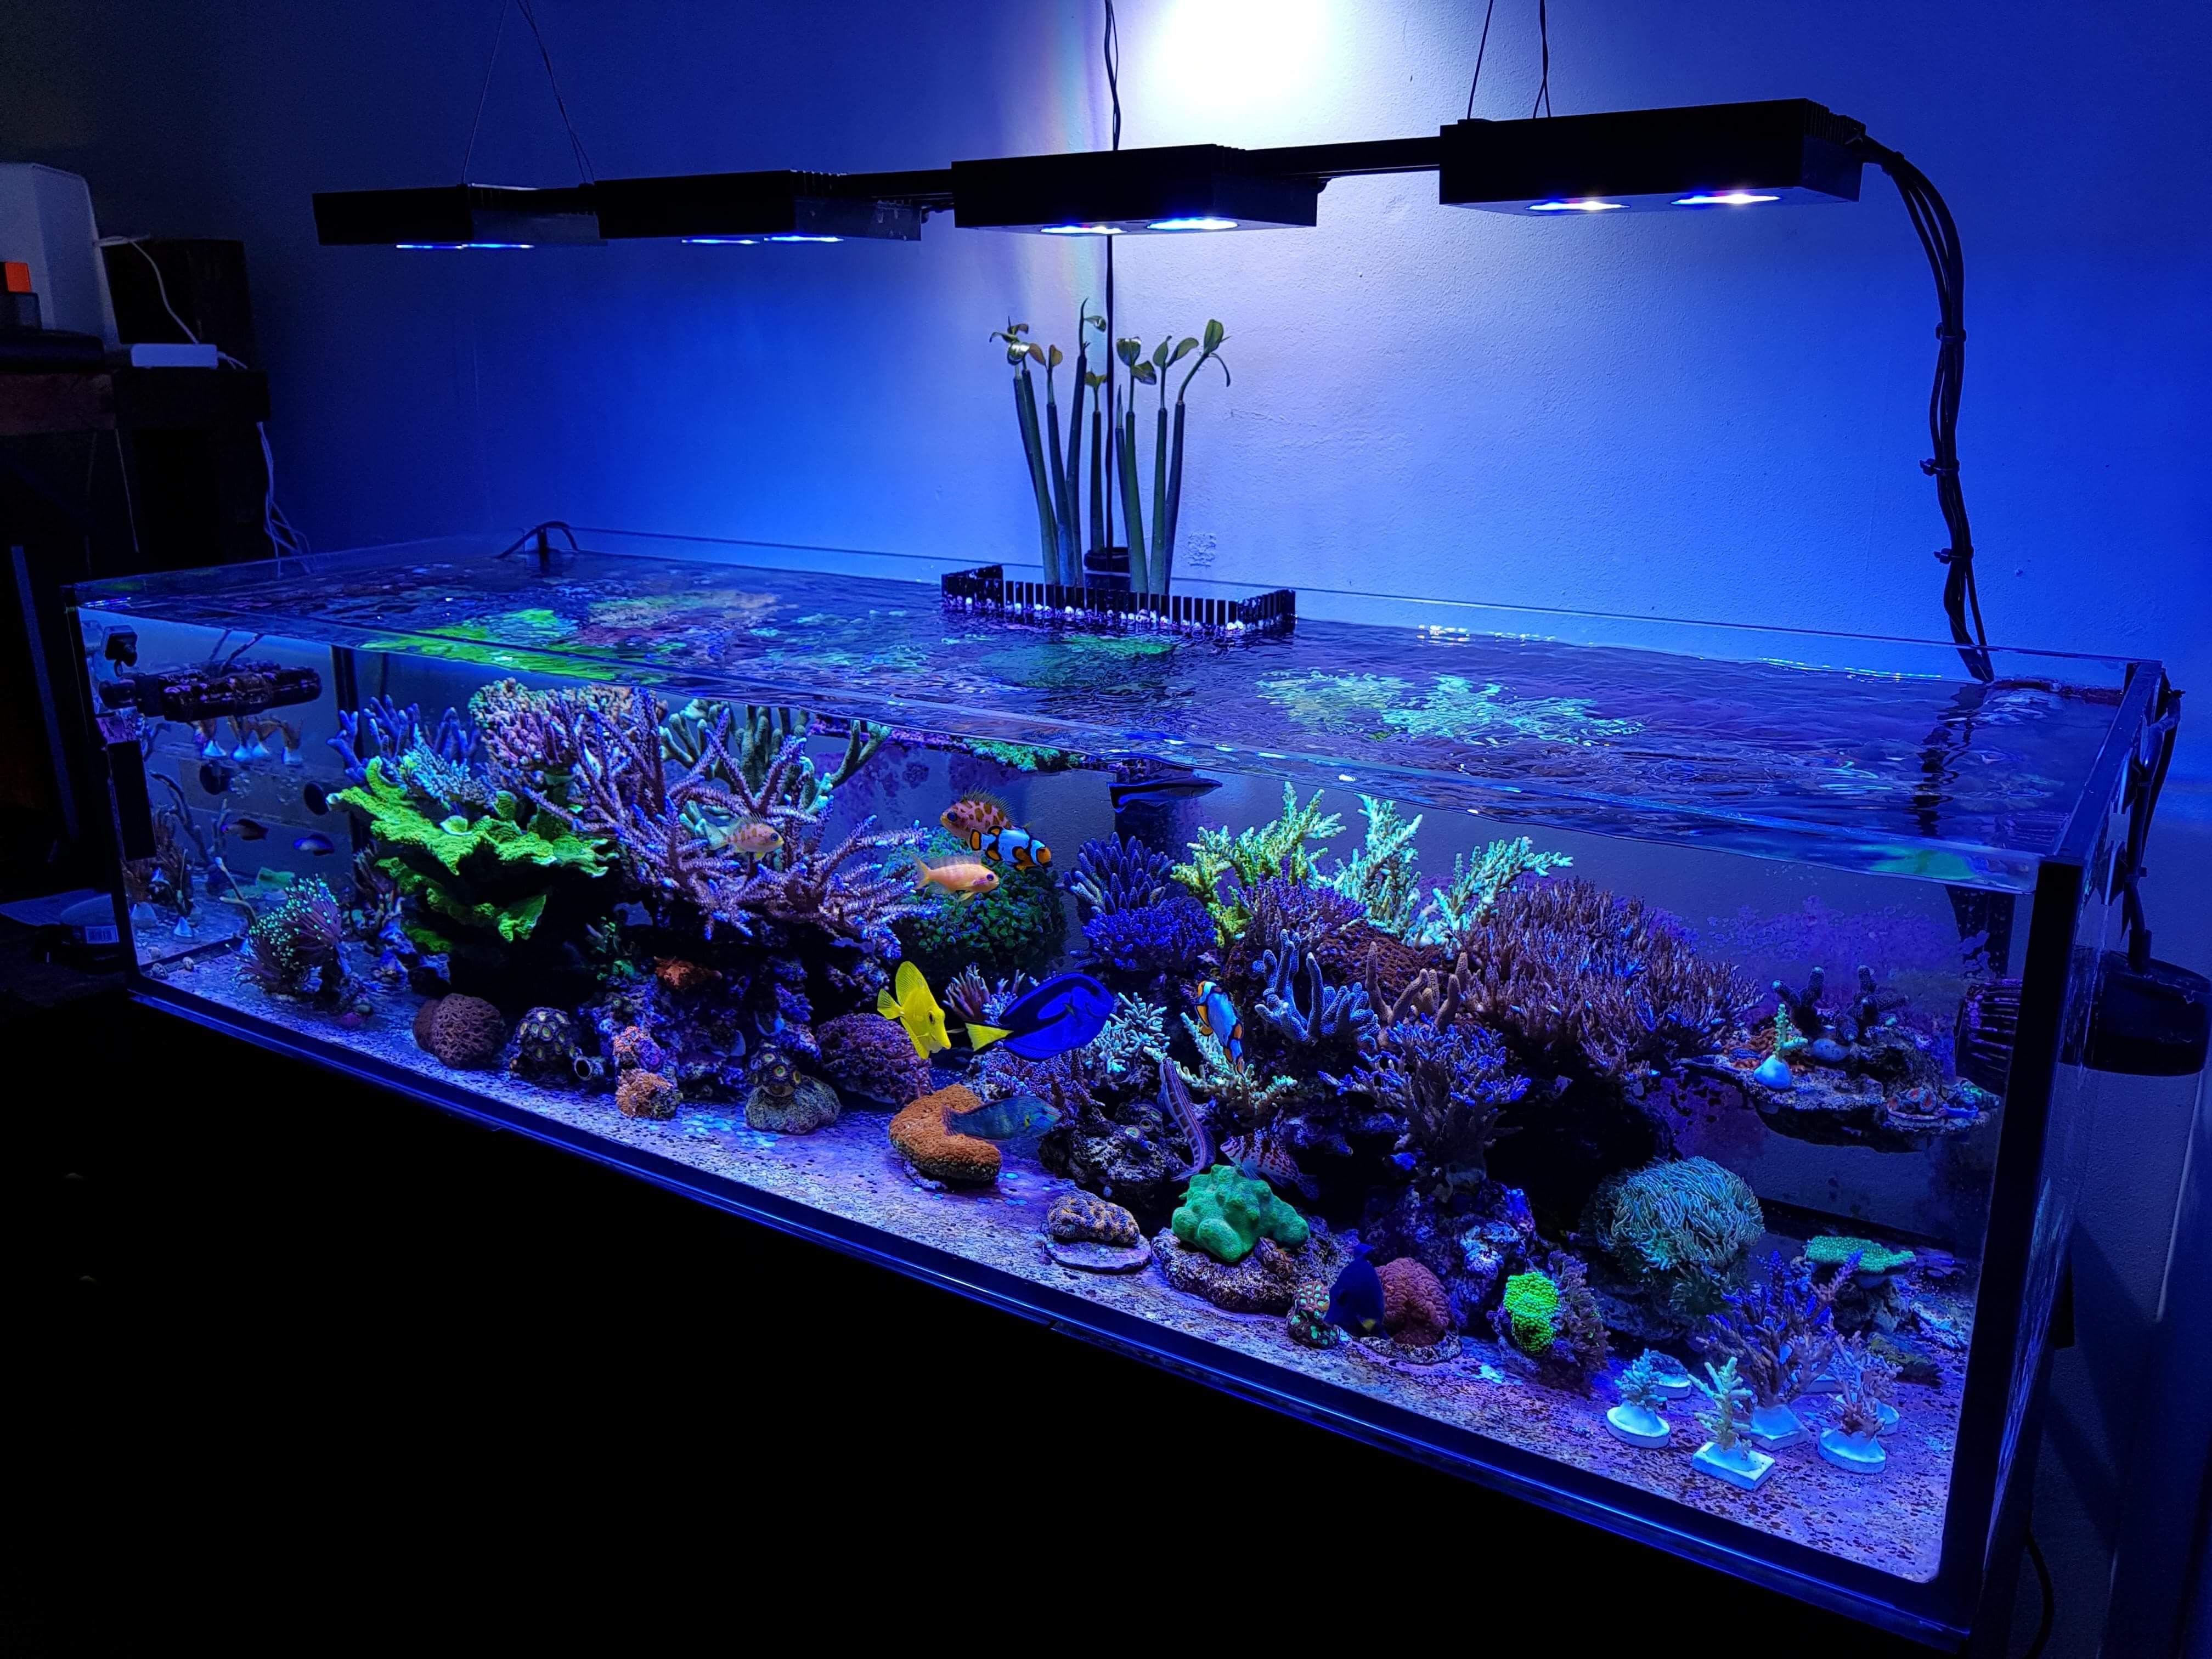 0417a79ba9d1944a17c0f657f67ec0b9 Frais De Aquarium Recifal Complet Concept